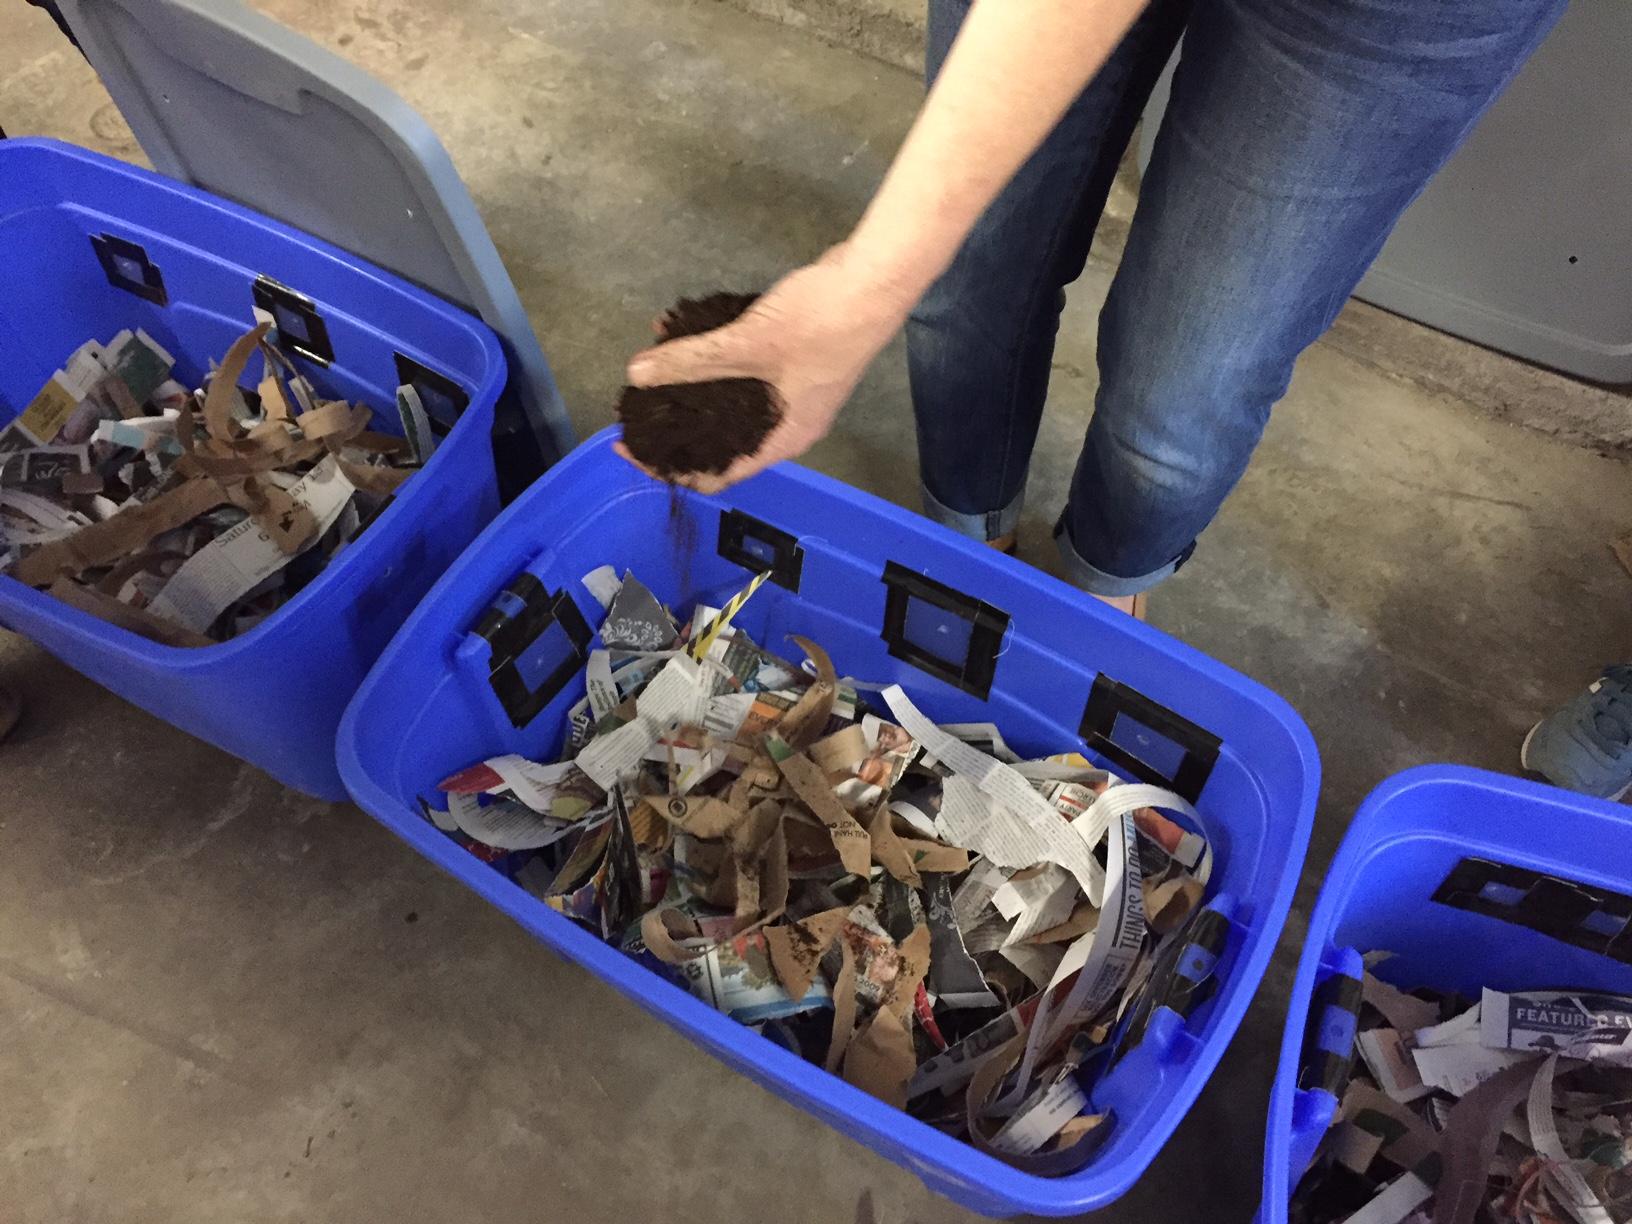 Building worm bins to use in Pathfinder's school garden. Photo courtesy of Tasha Mosher.